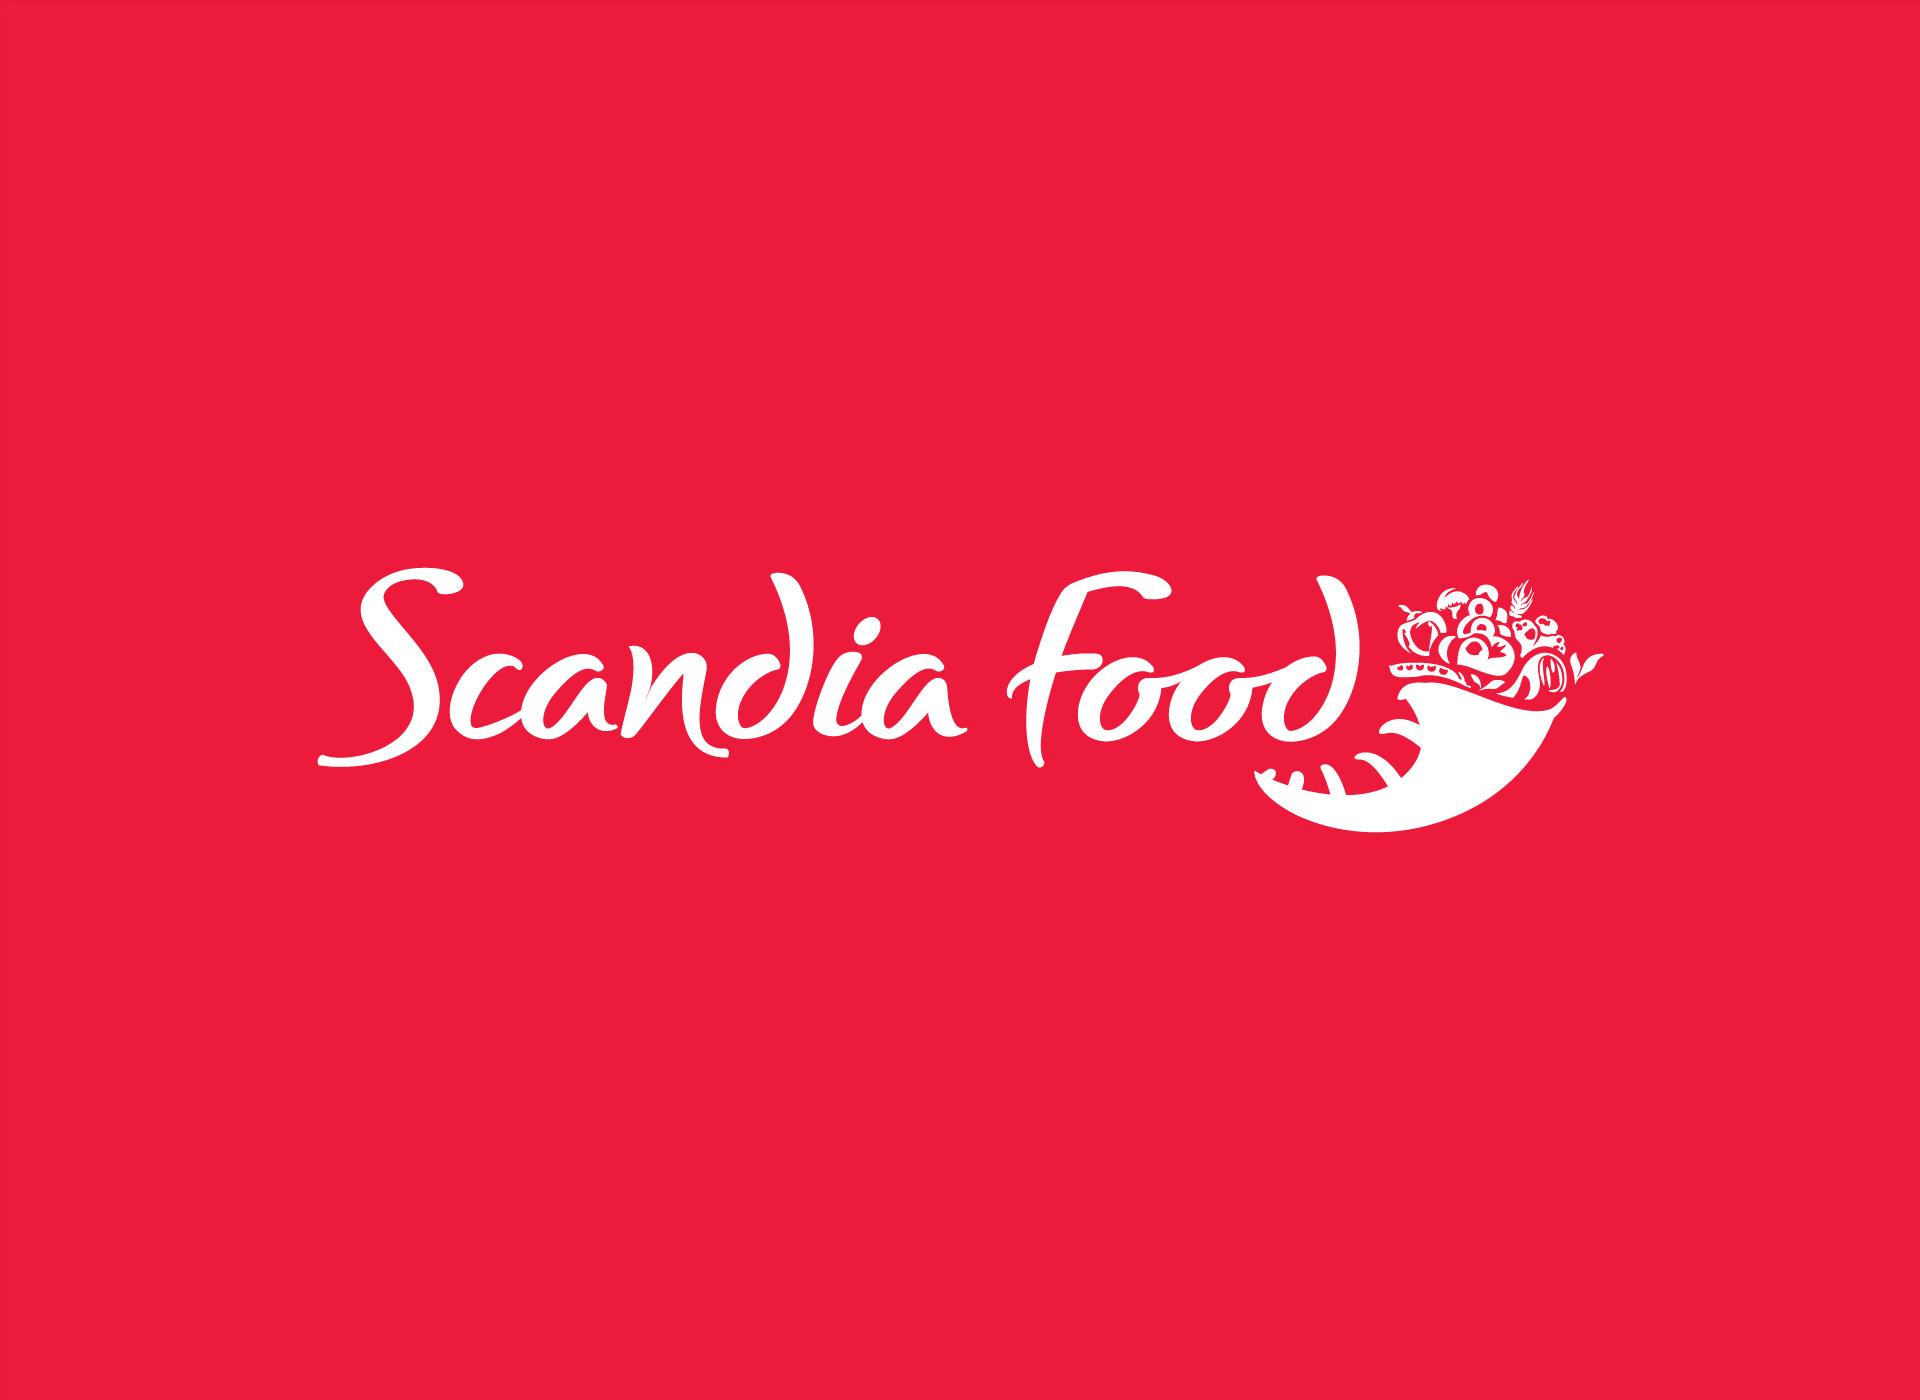 Scandia Food